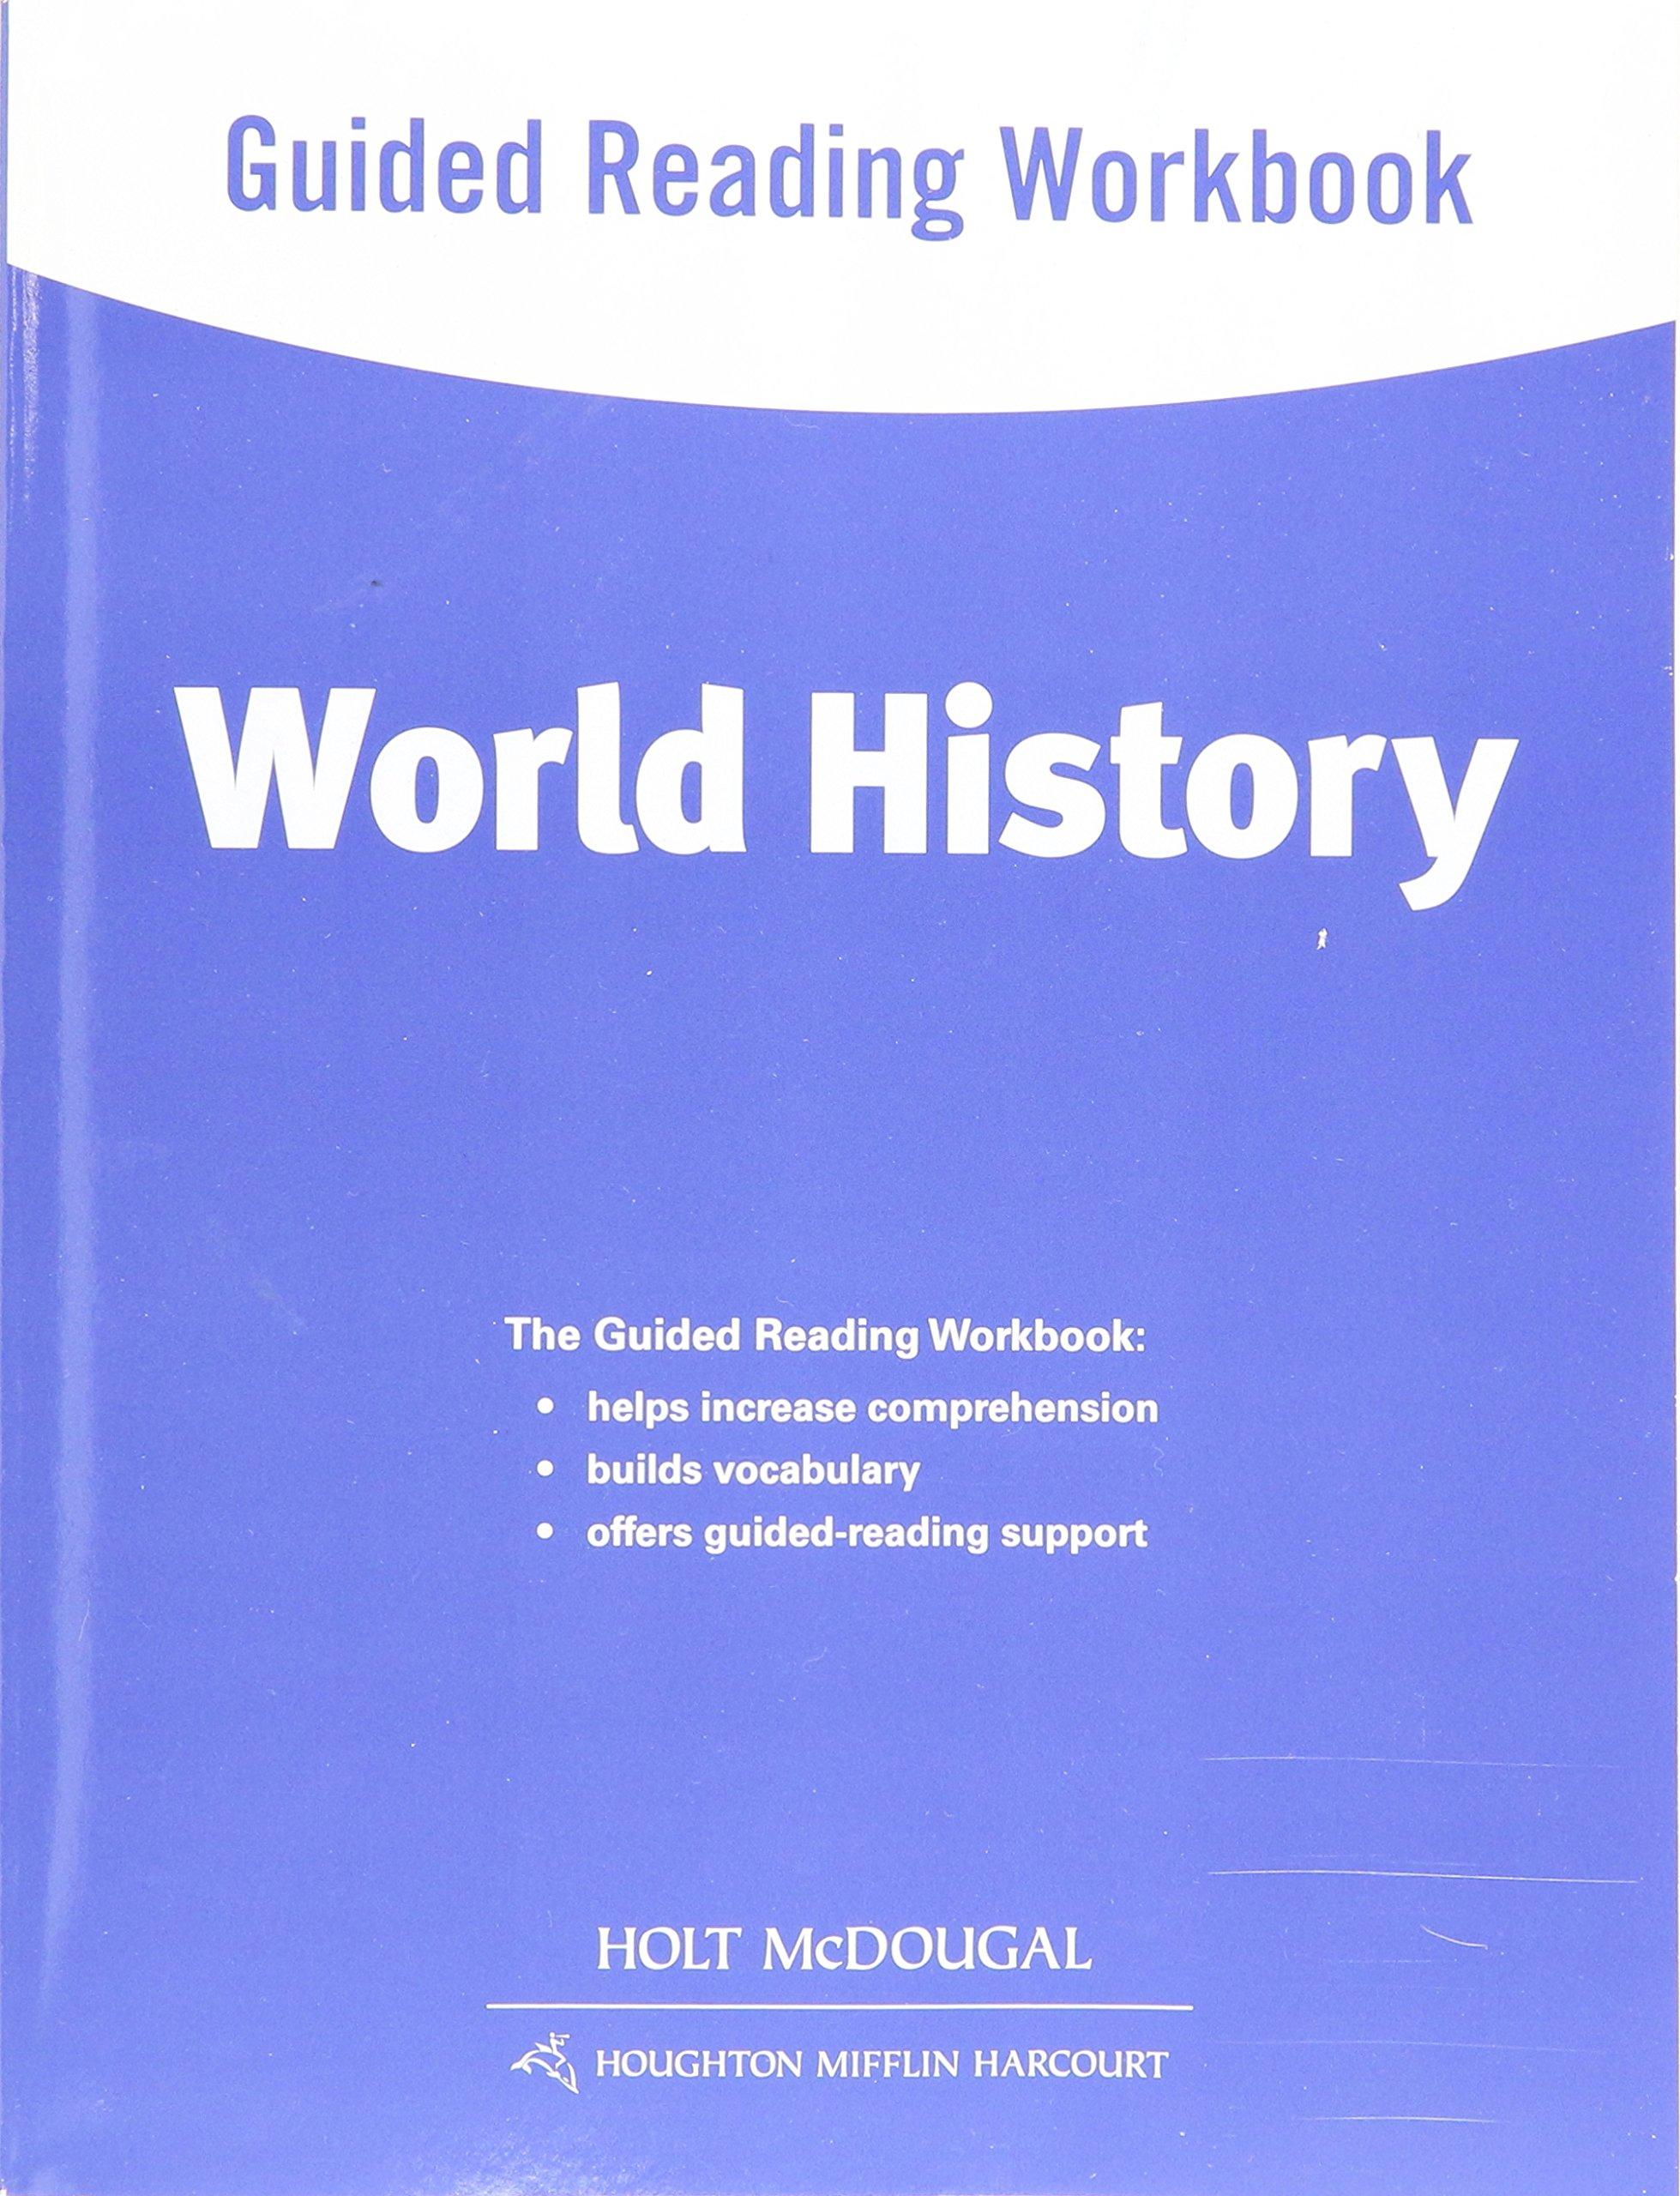 World History: Guided Reading Workbook Survey PDF